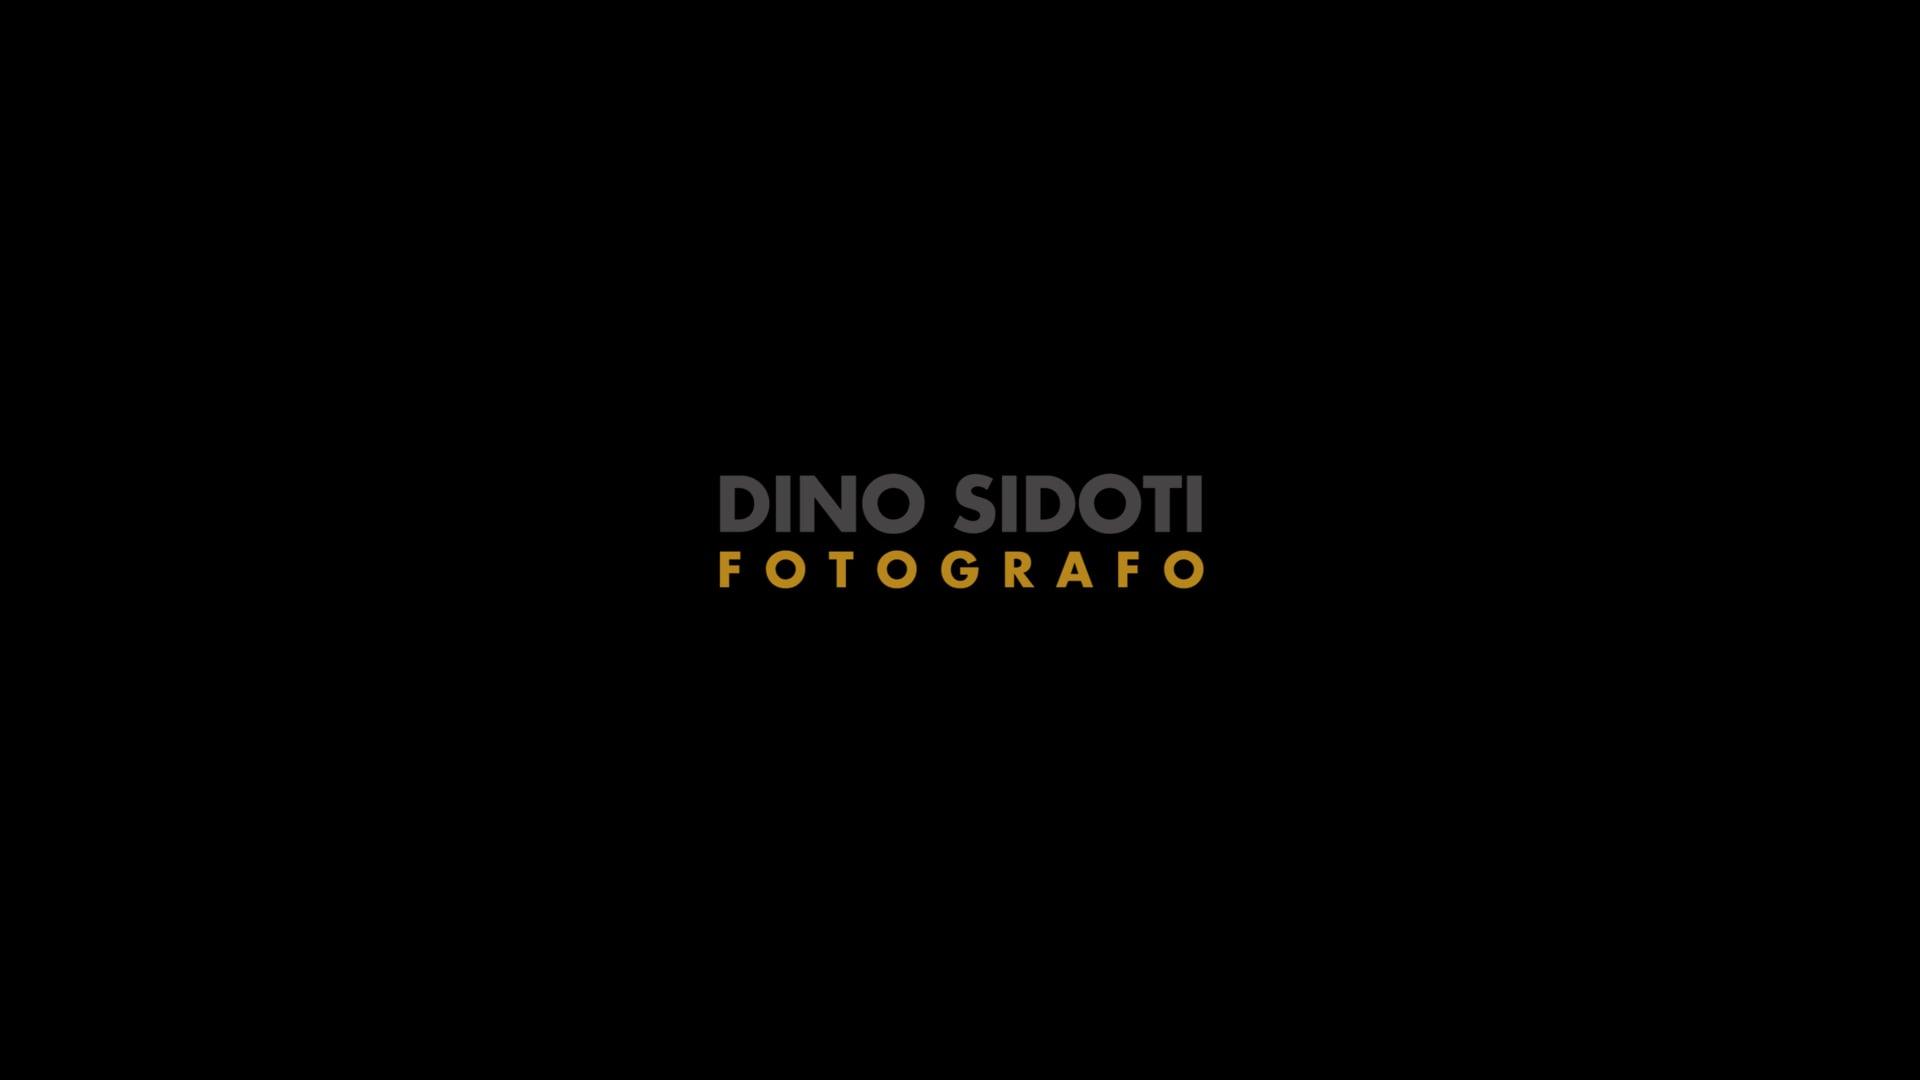 Dino Sidoti fotografo